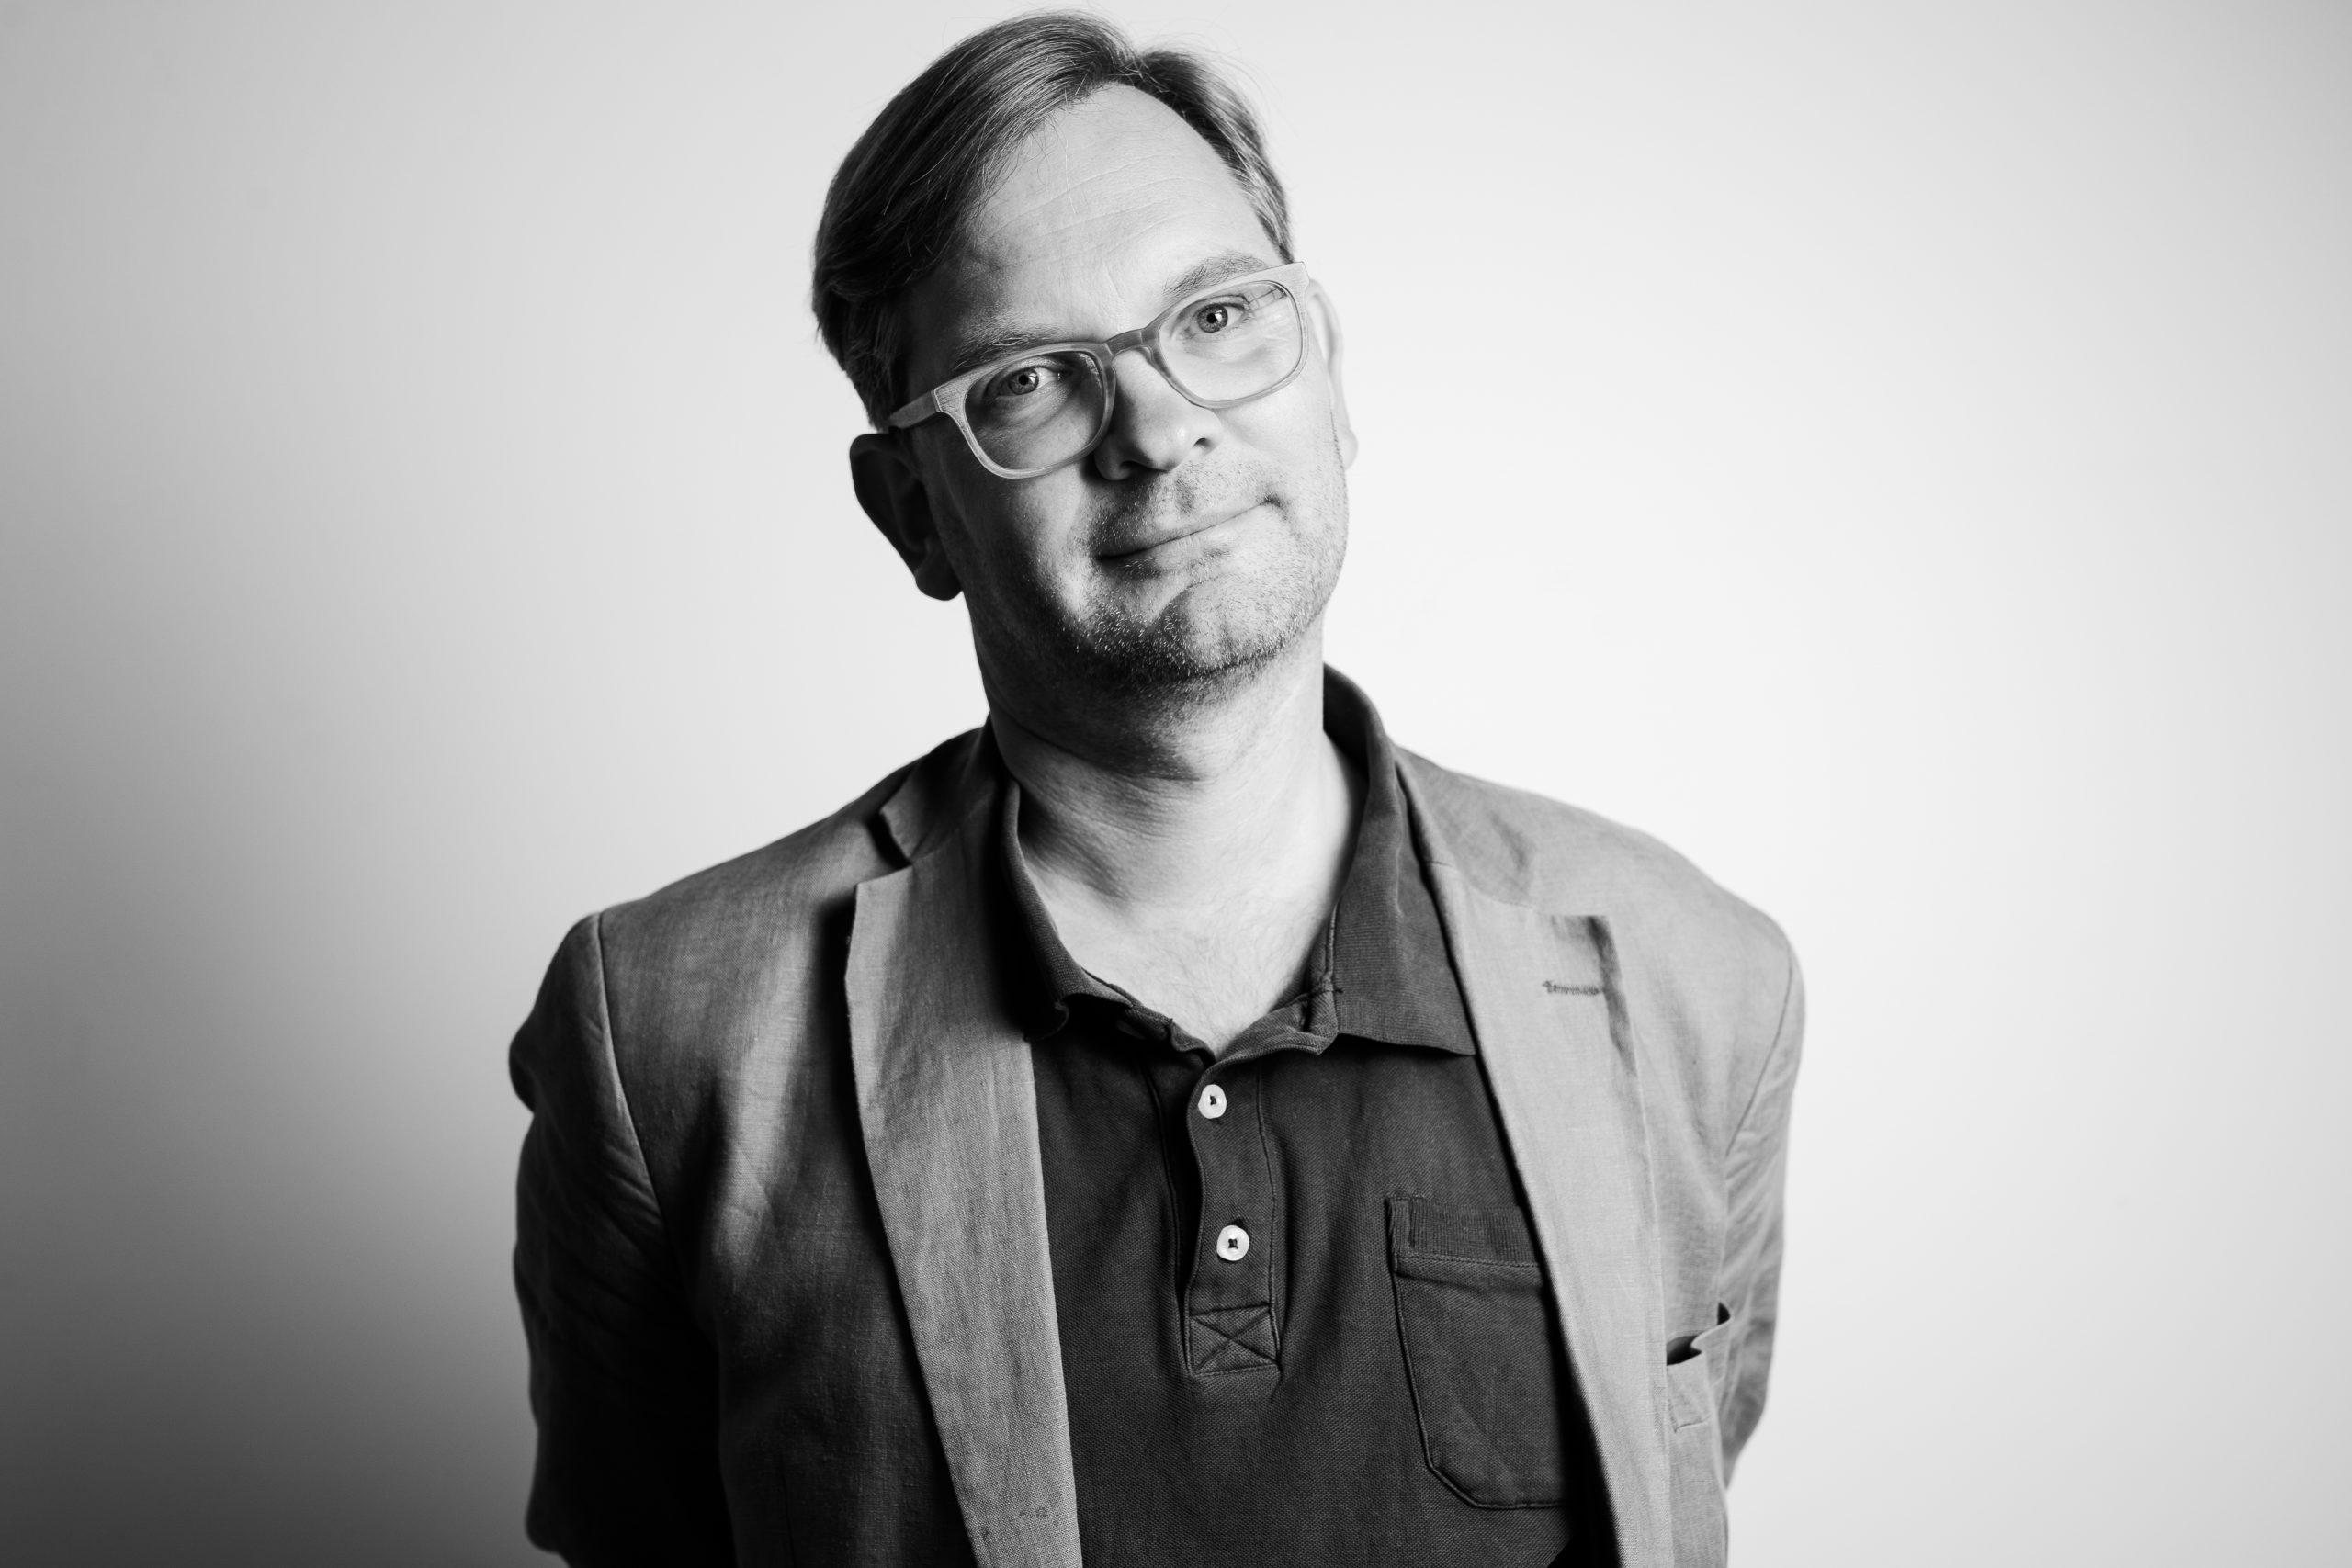 Matthias Riesenhuber